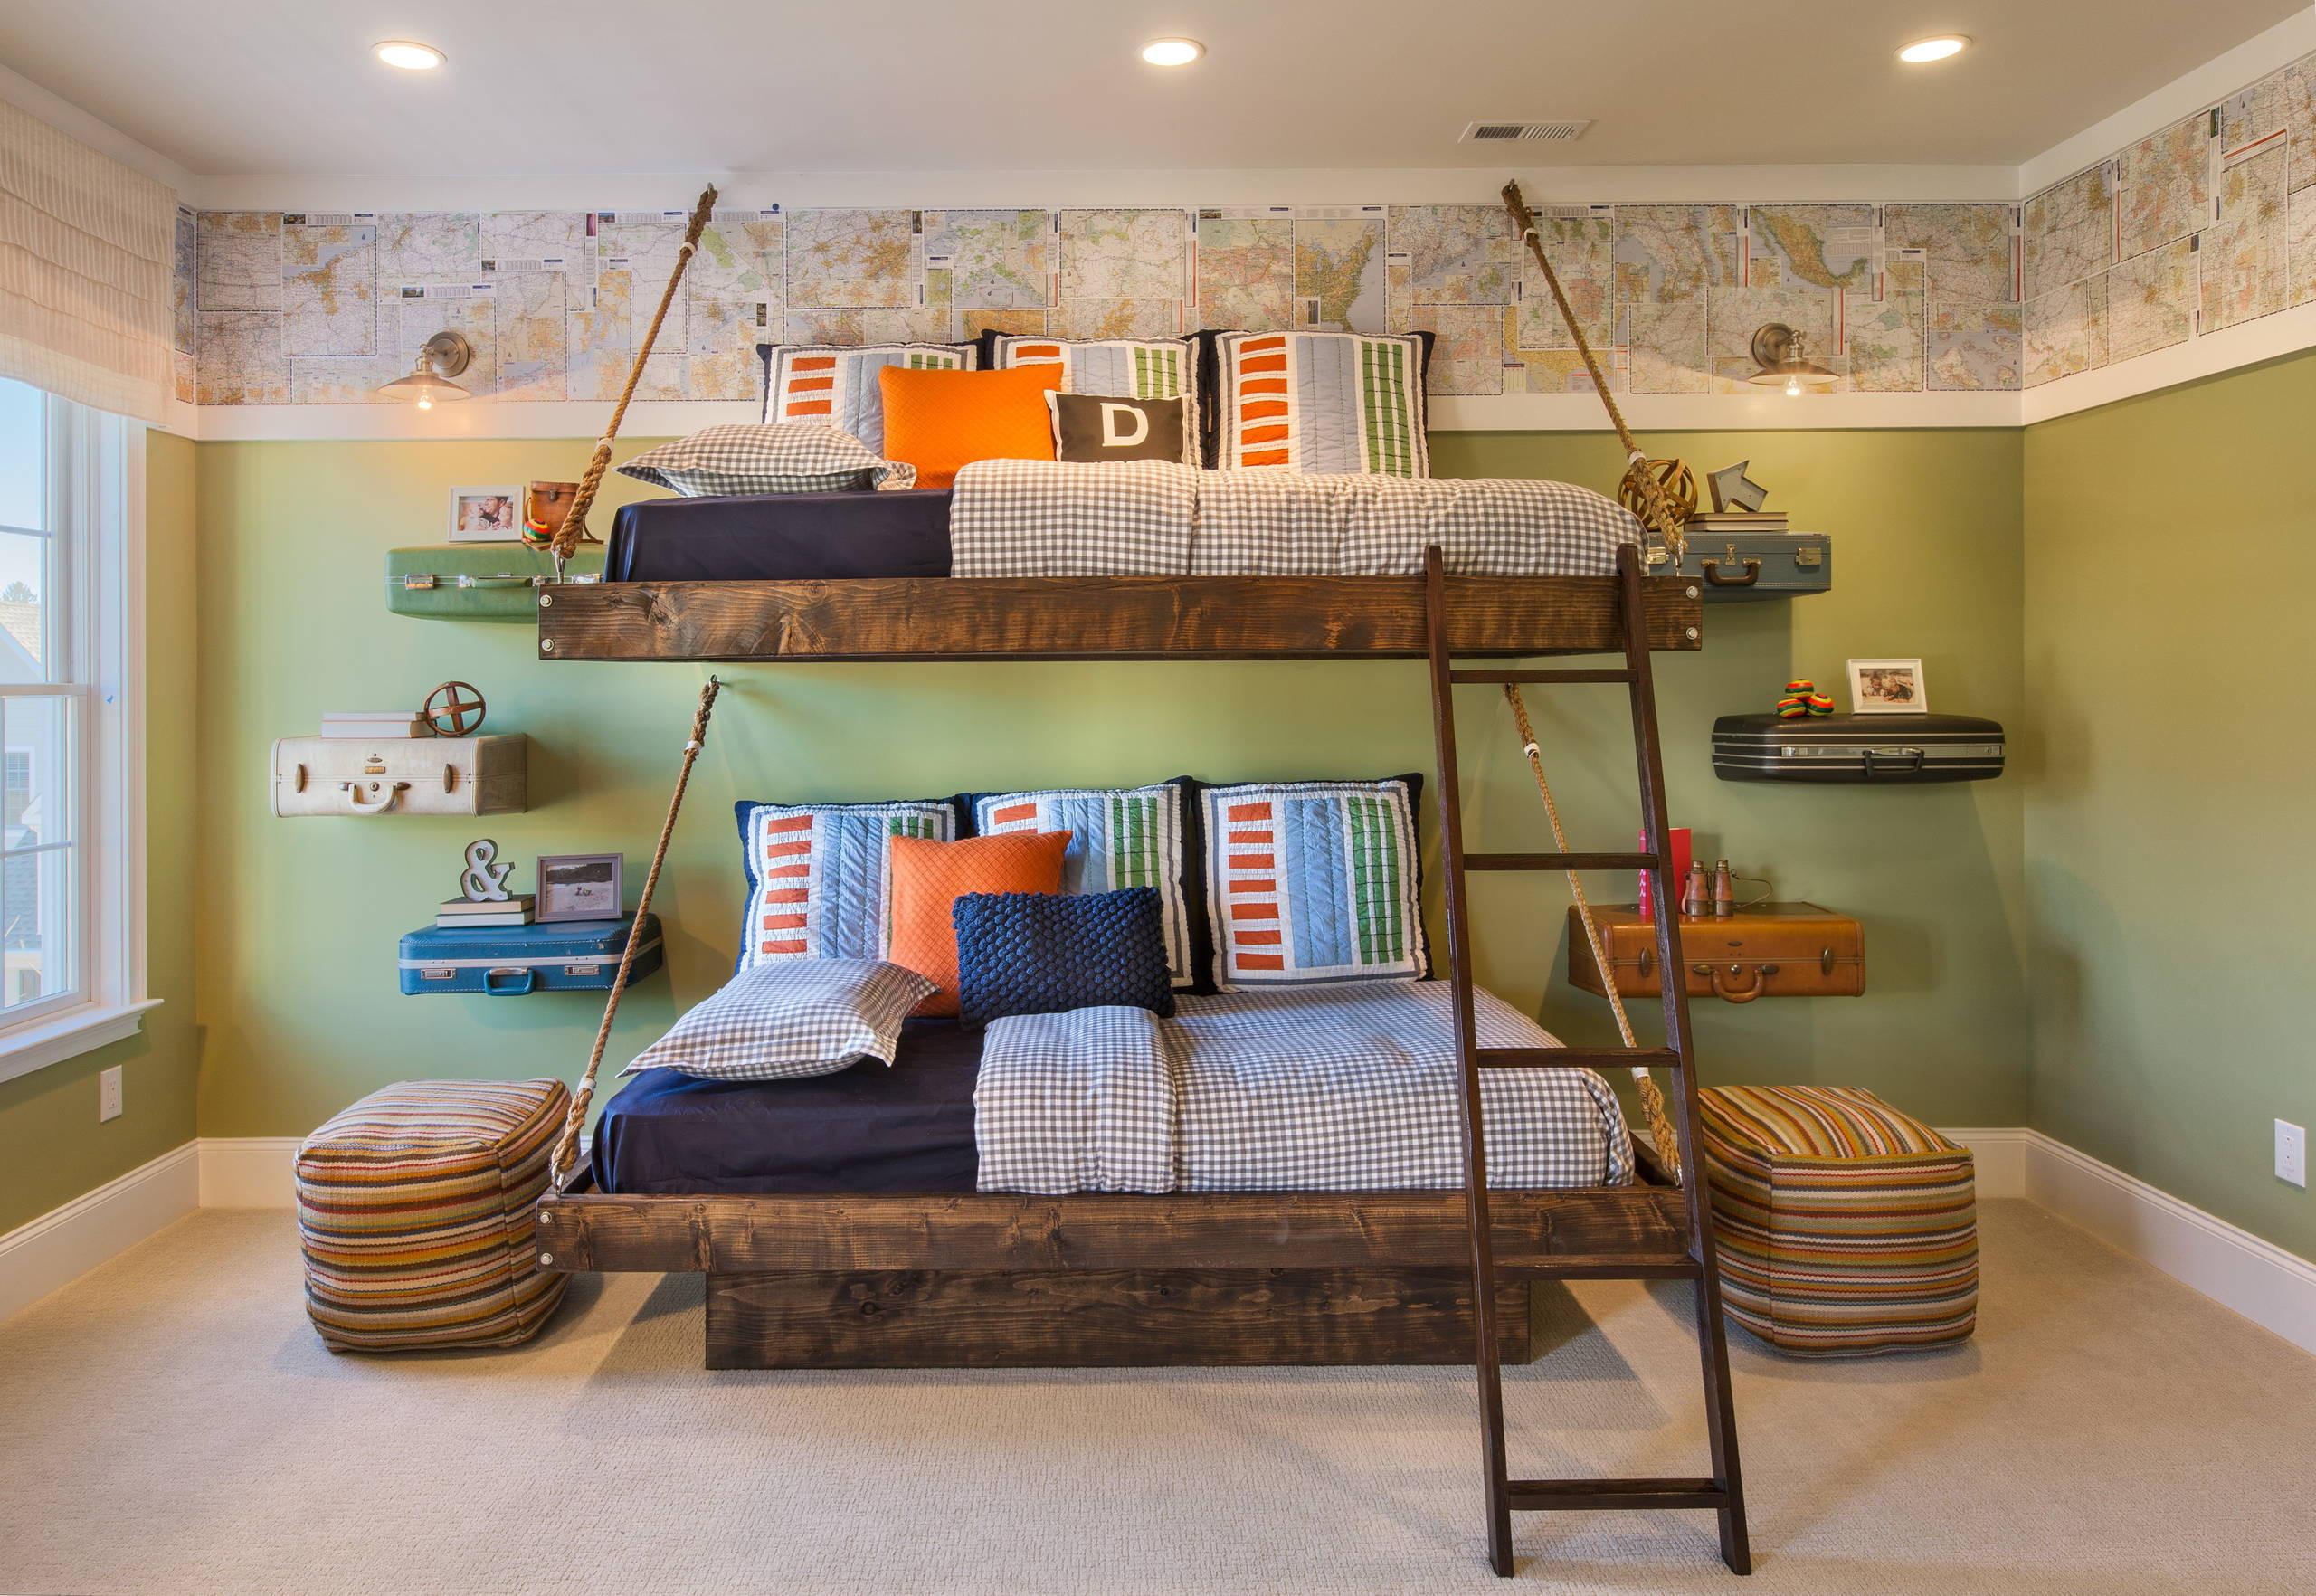 Rustic Kids Room Designs 15 Charming Rustic Kids Room Designs that Strike with